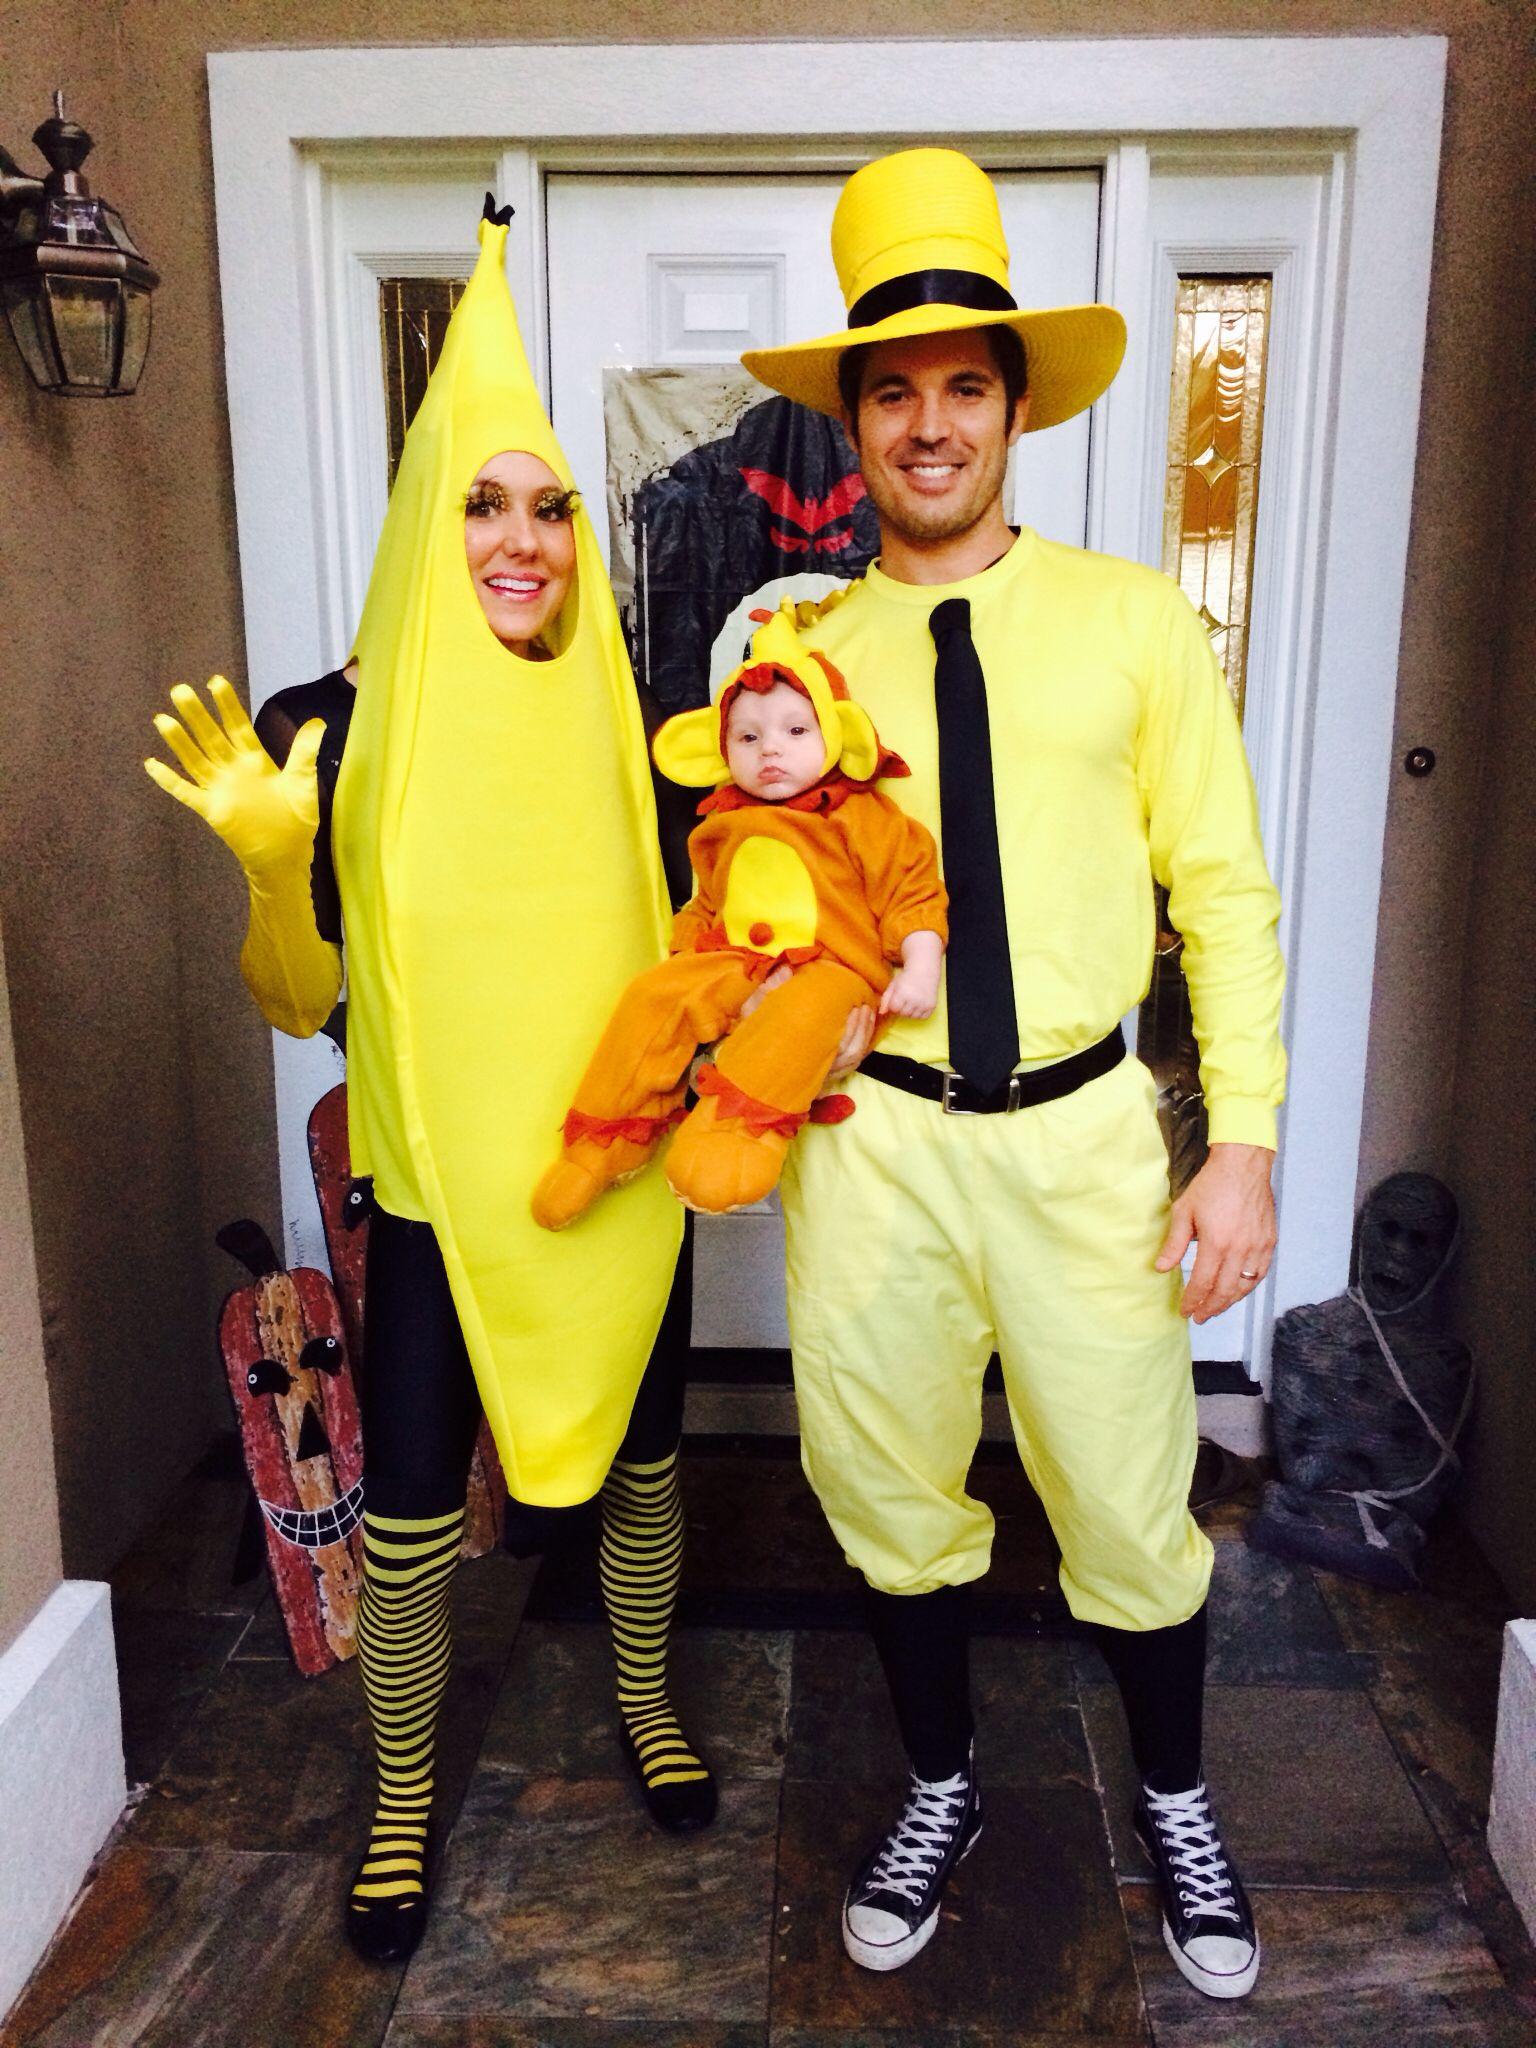 Family of three Halloween costume idea. Curious George inspiration ...